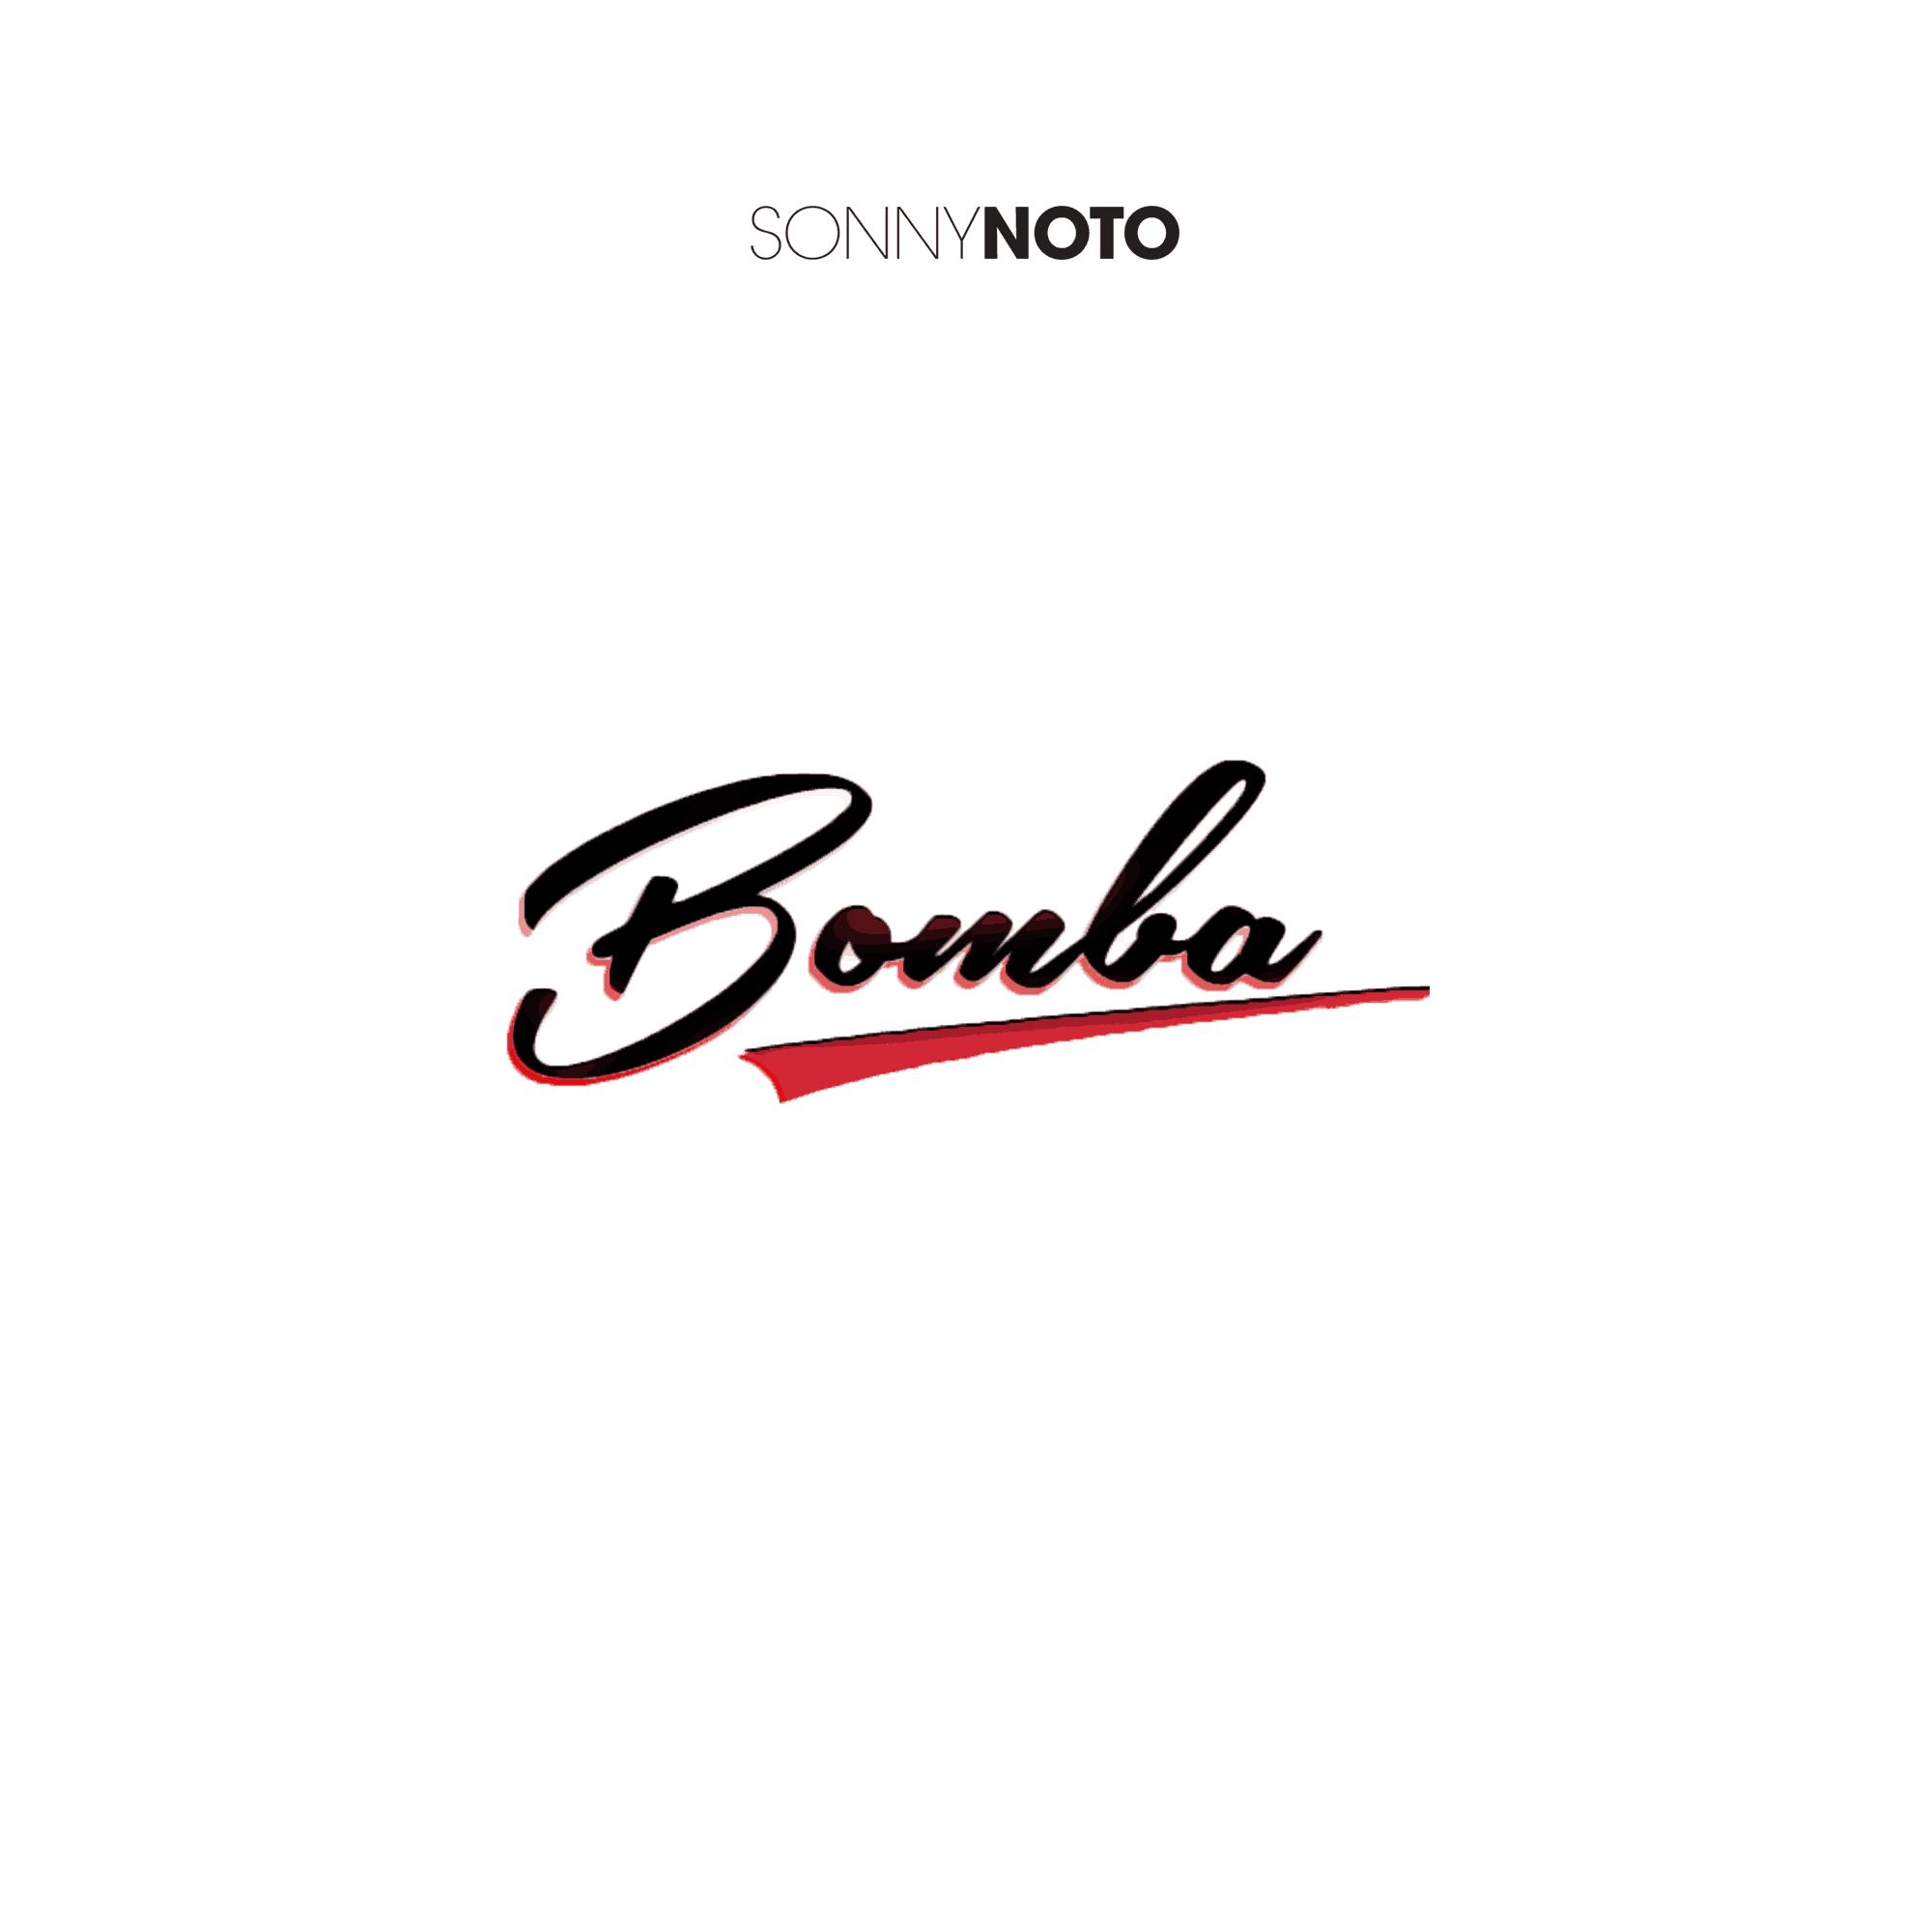 Sonny Noto delivers Carnival-inspired track 'Bomba'